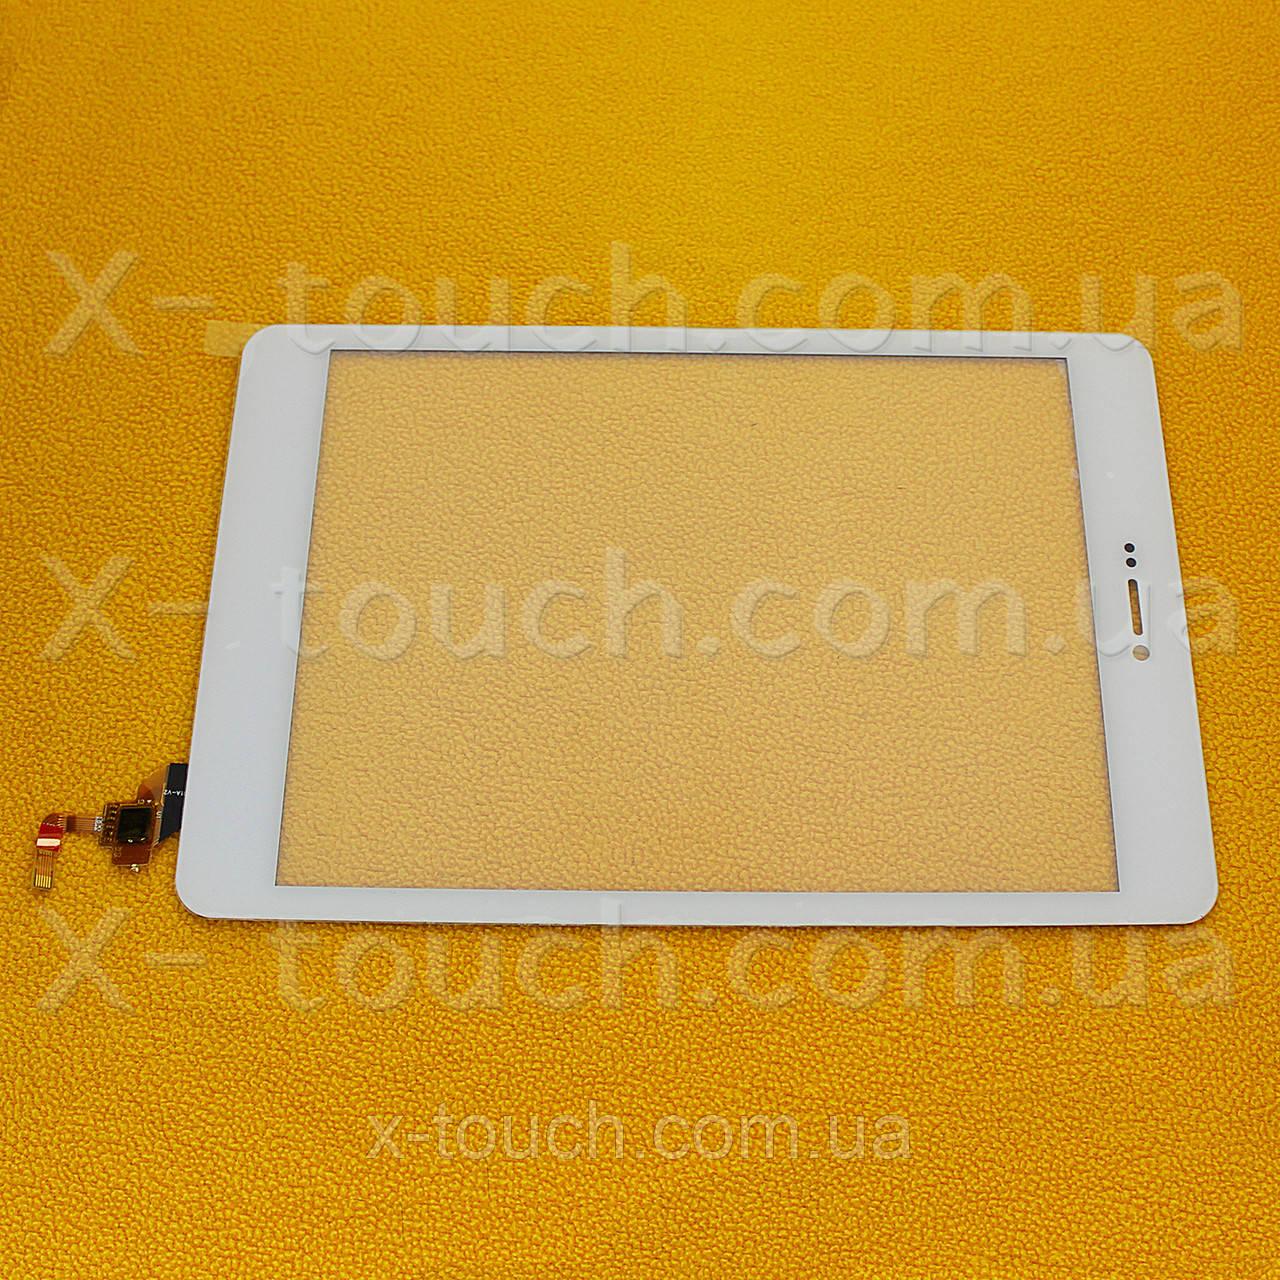 Тачскрин, сенсор  PB80JG9033-R1 белый для планшета